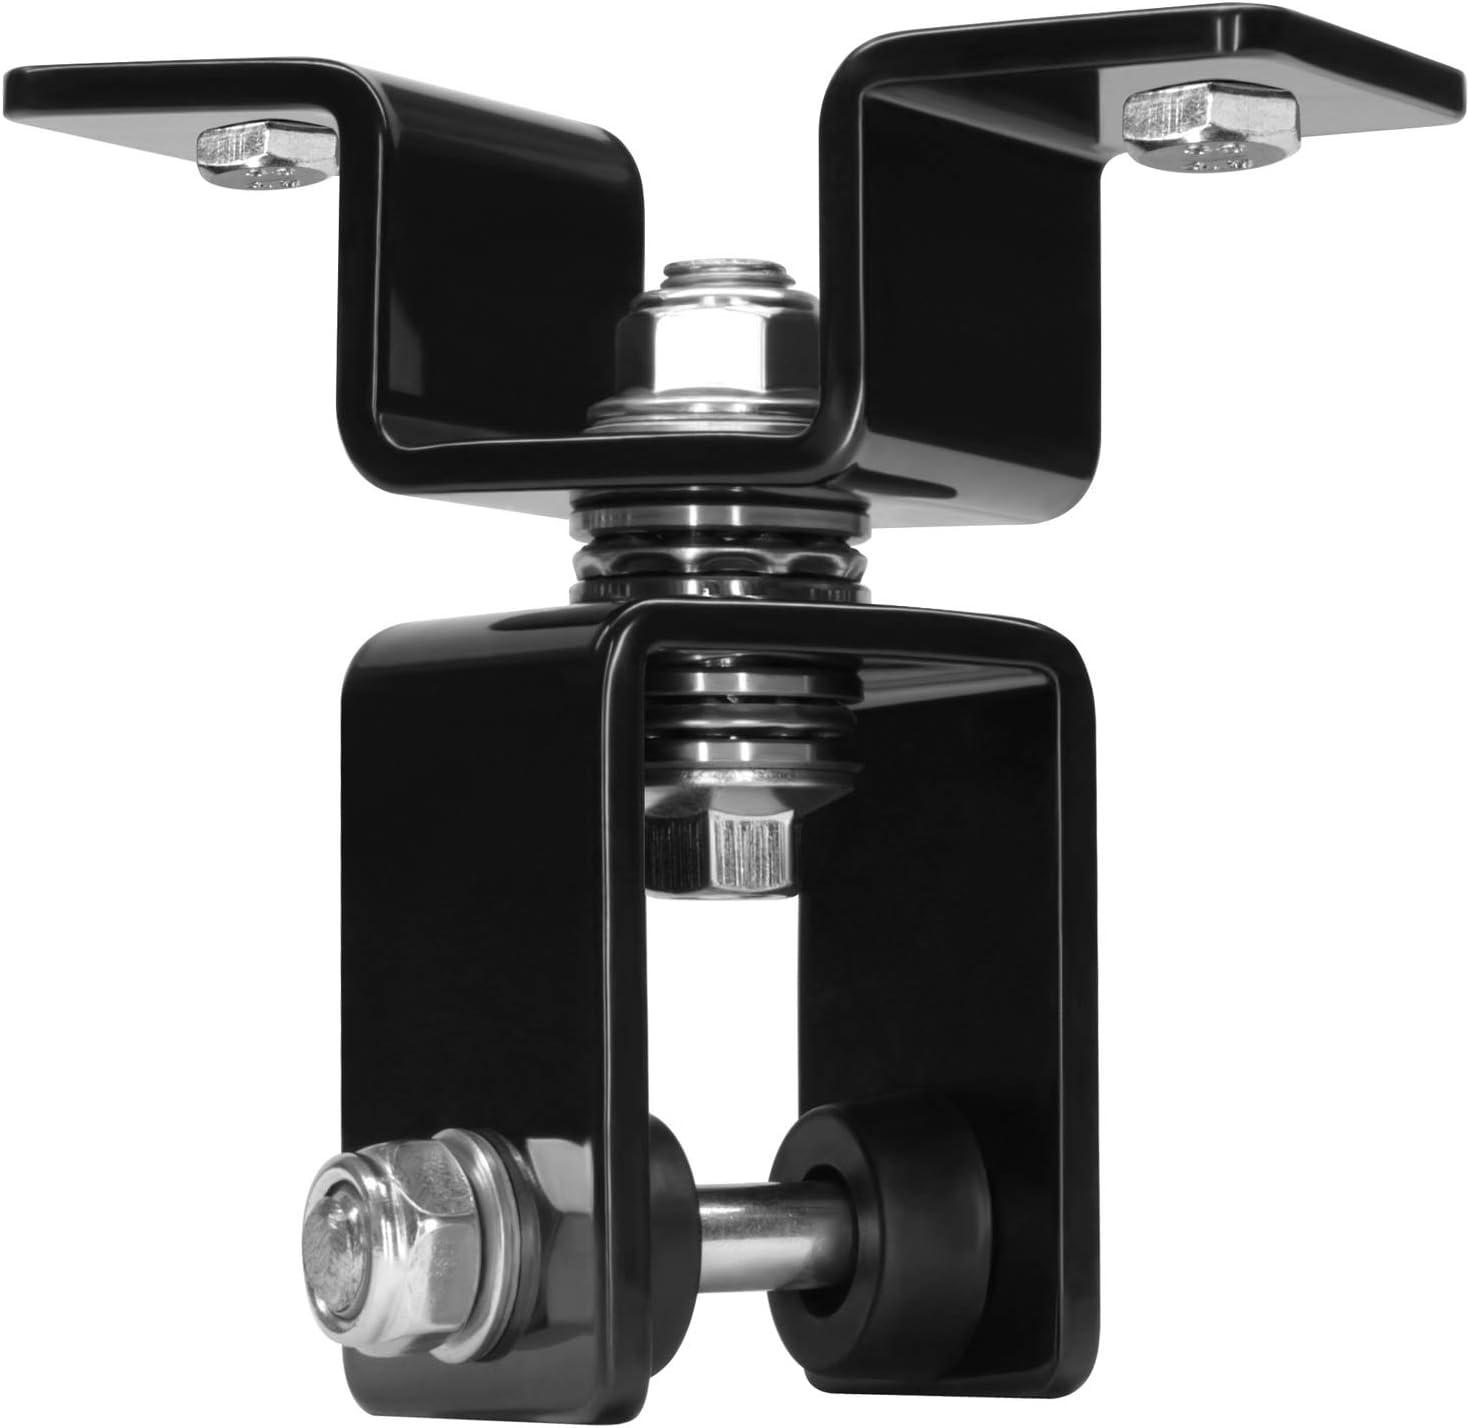 yes4allプレミアム木材梁ヘビーバッグハンガー – 360 °回転&簡単にインストール 黒 - Wood Beam Hanger